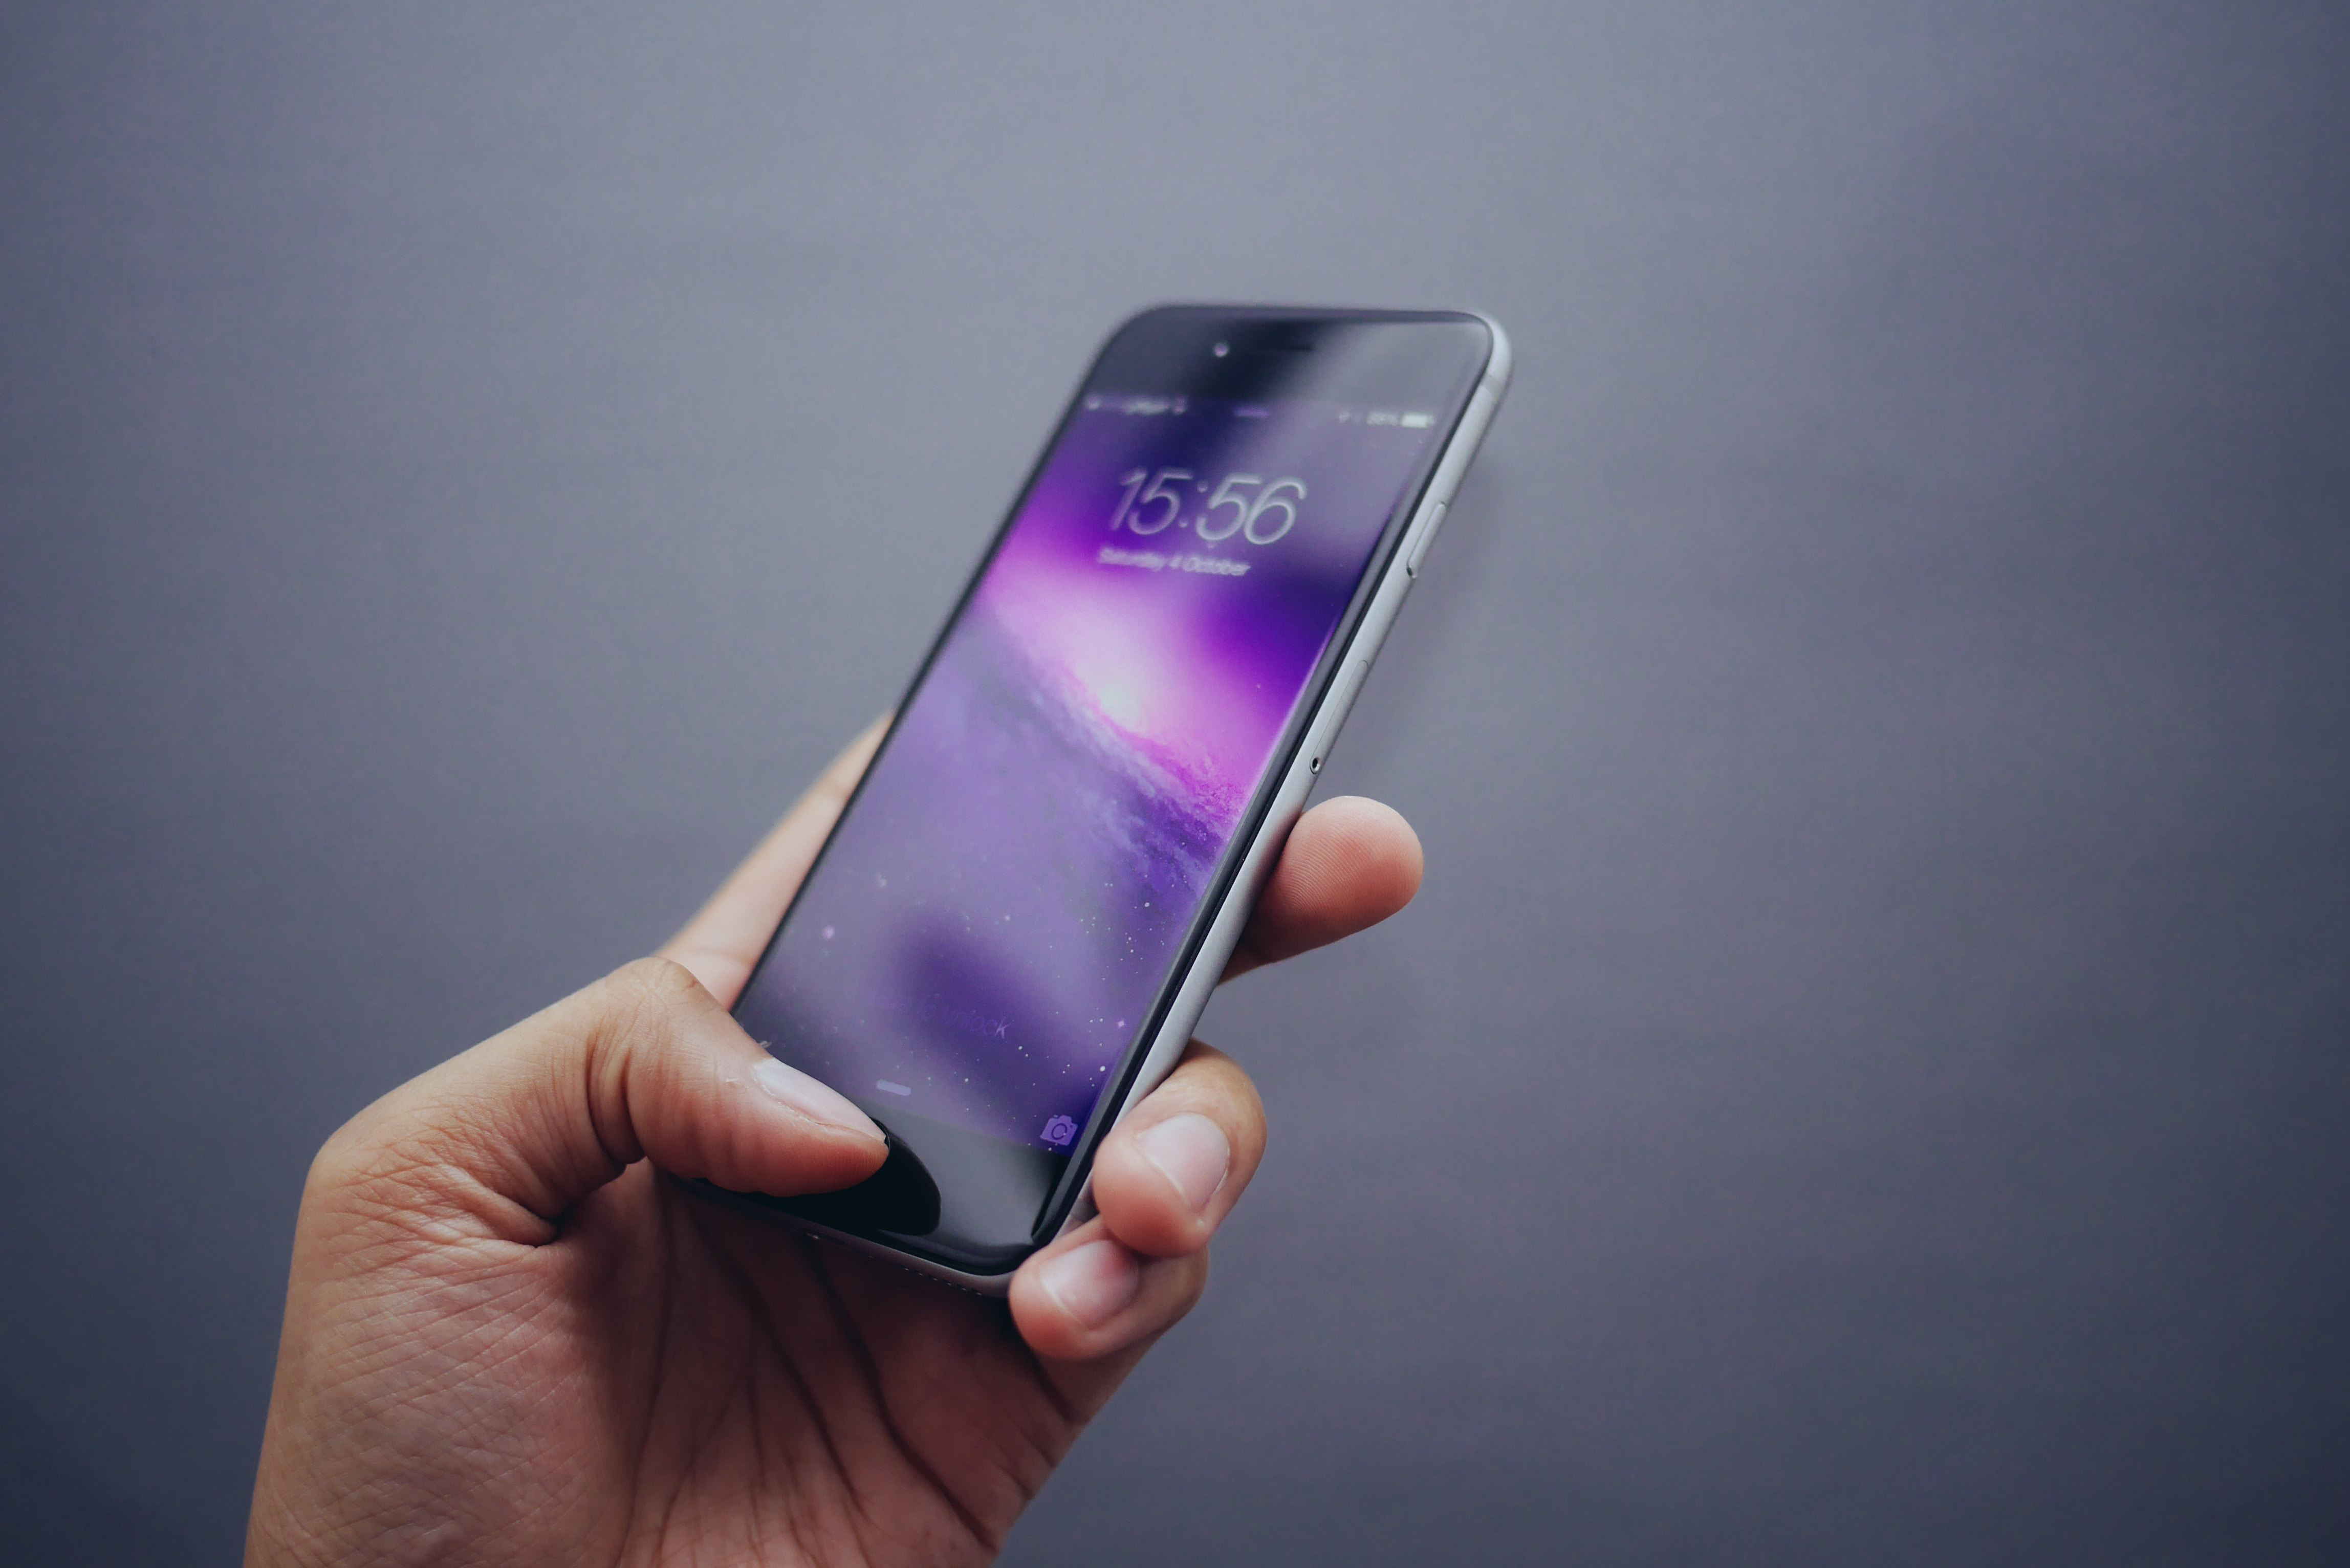 layar smartphone yang lebar